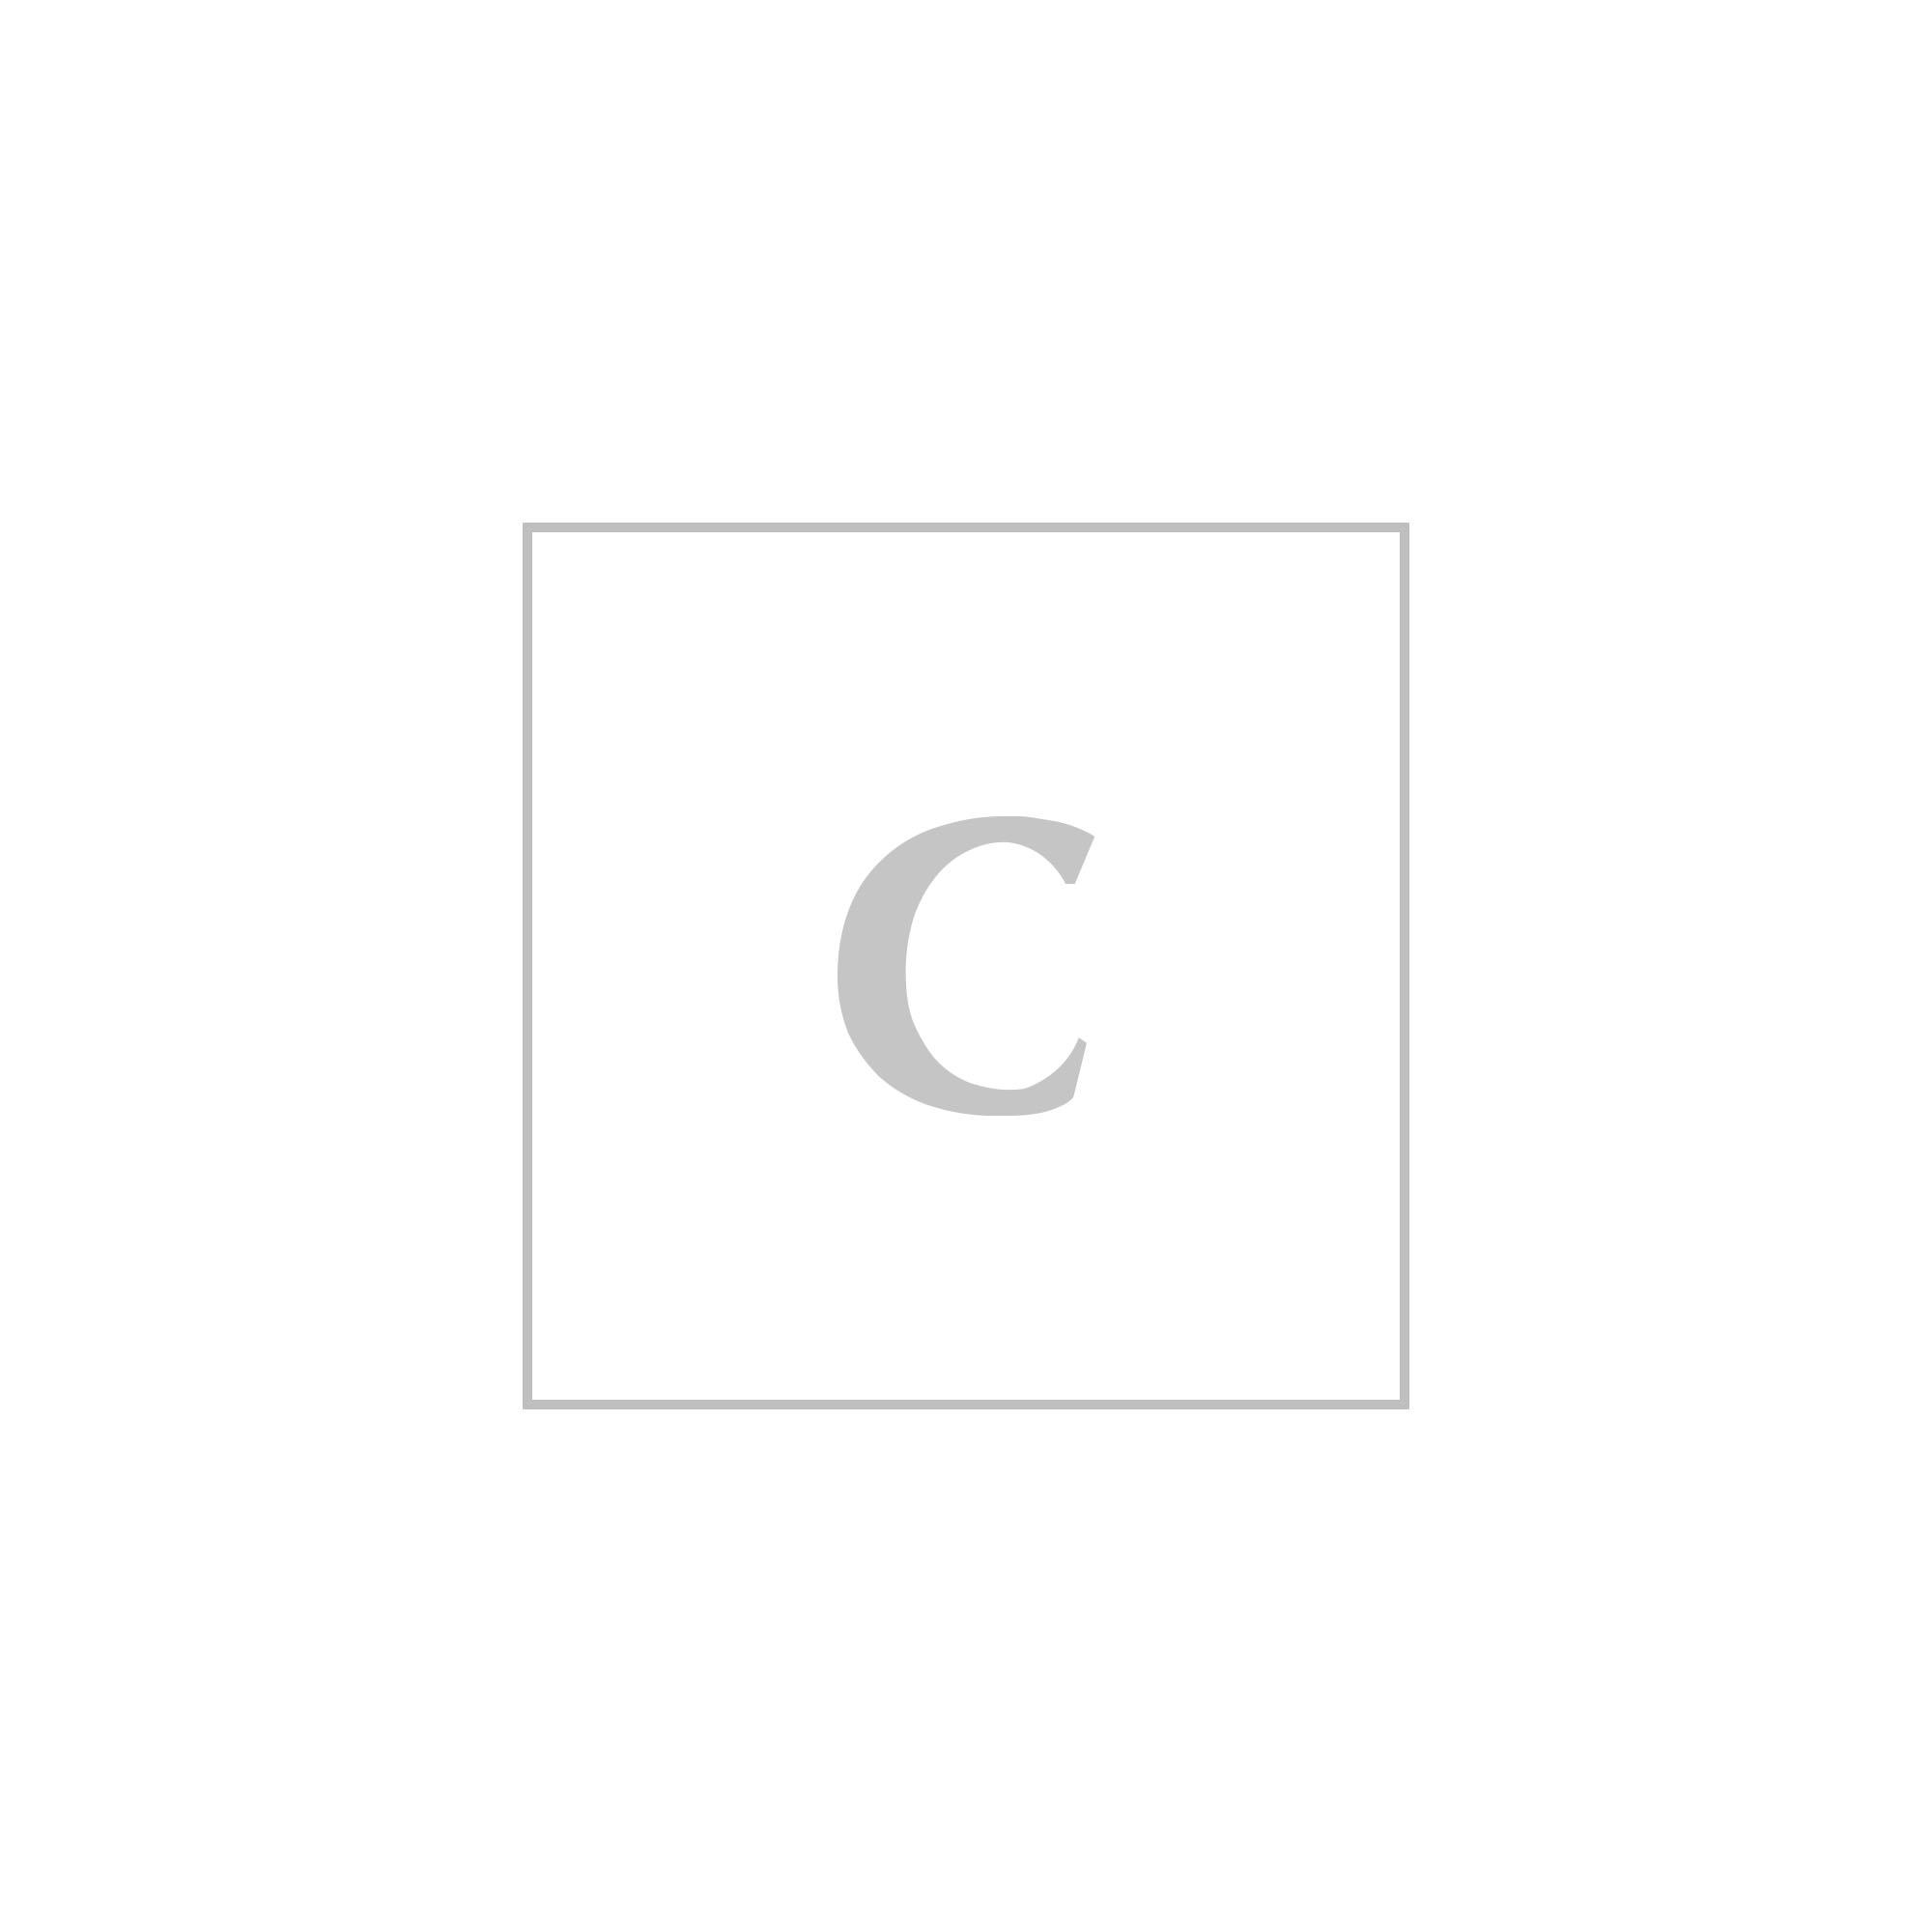 dolce & gabbana borse uomo marsupio nylon logo